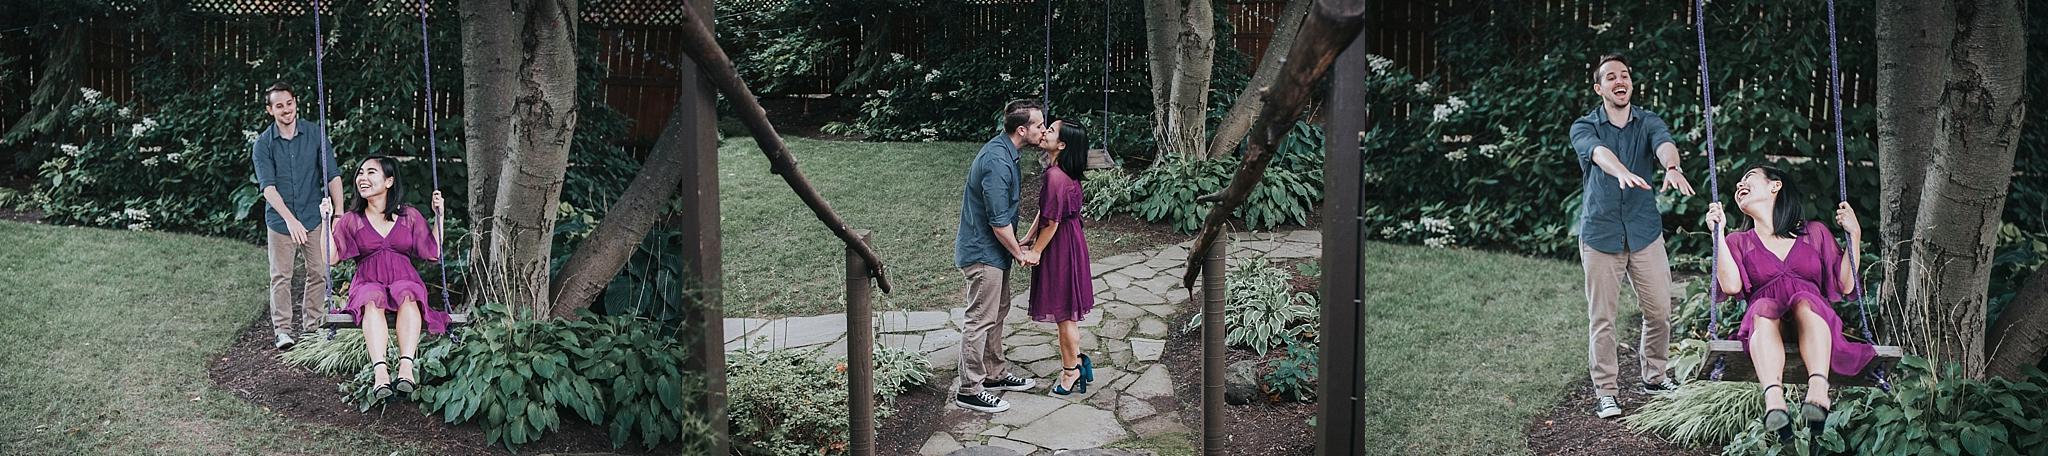 Pittsburgh-engagement-choderwood-sandrachile_0004.jpg